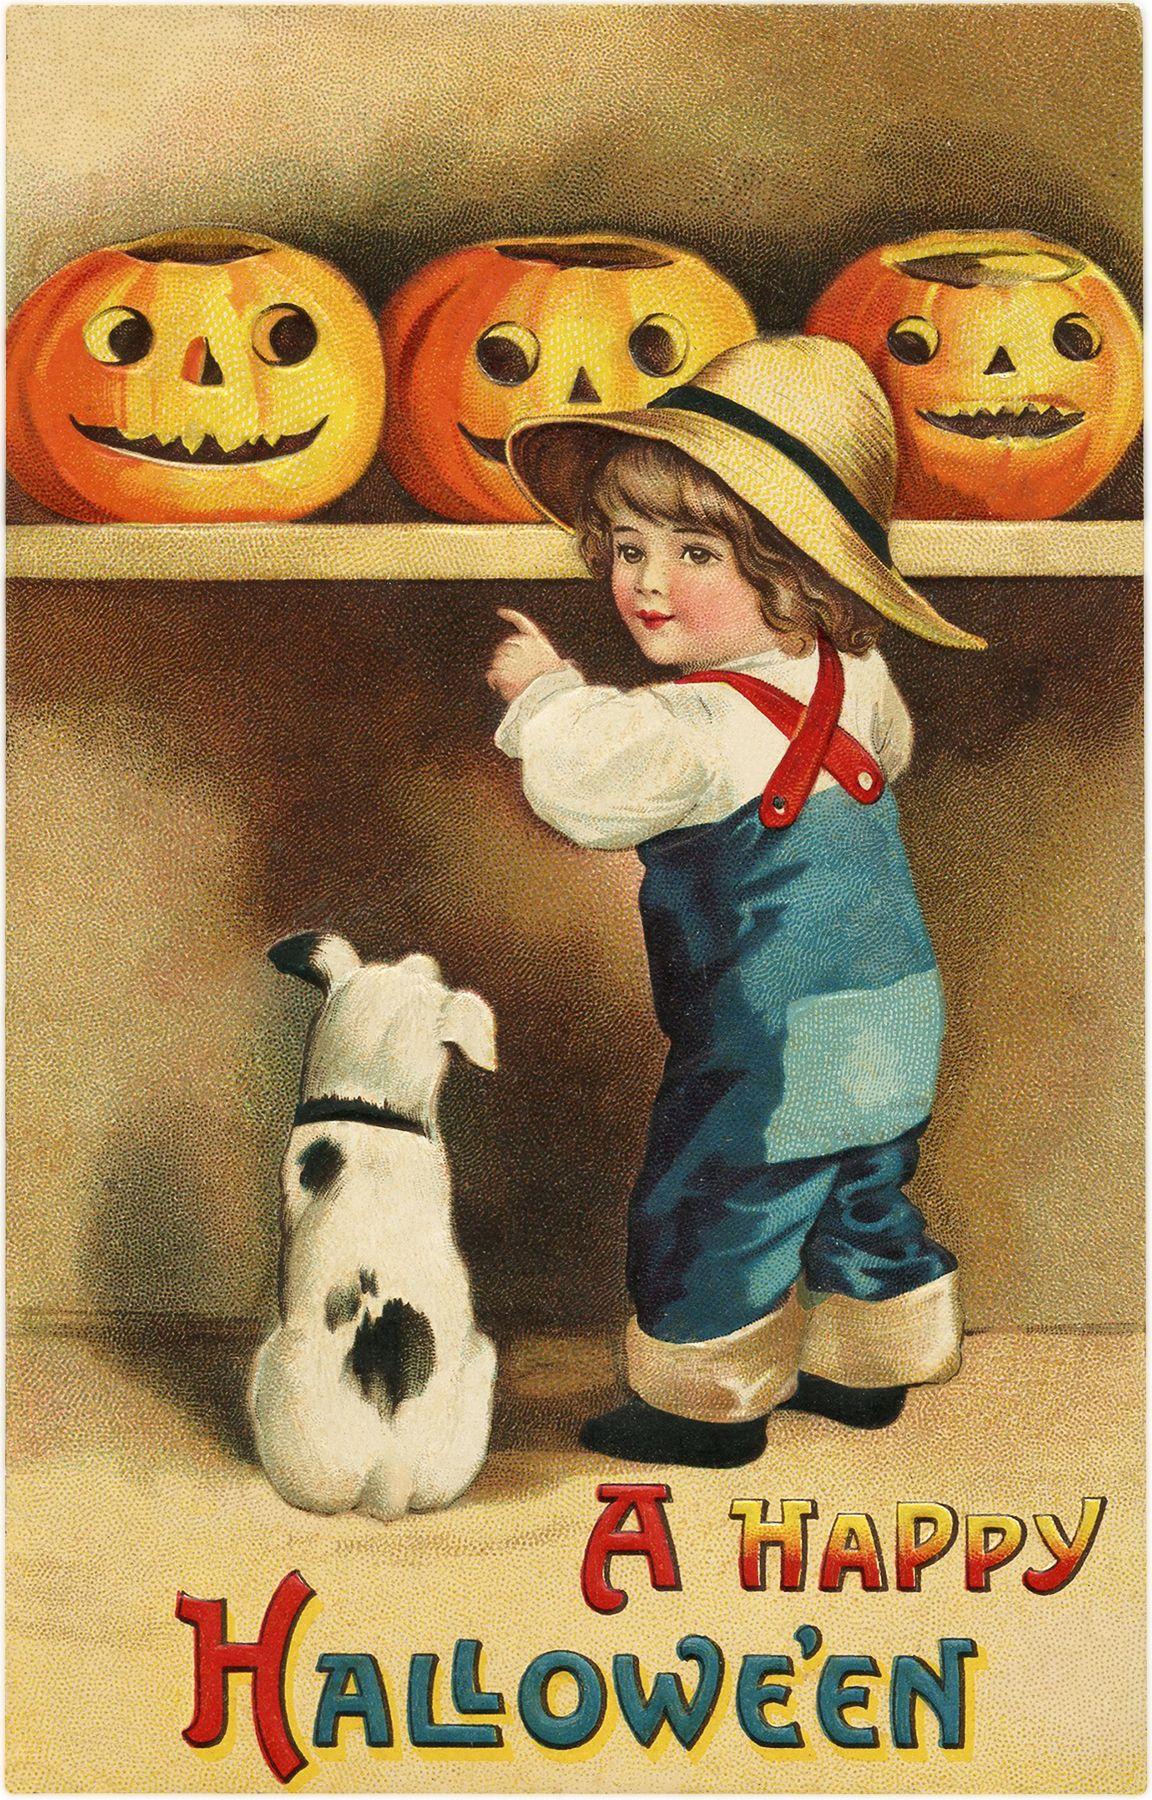 18 Halloween Kids With Pumpkins Clipart Updated Vintage Halloween Cards Vintage Halloween Greeting Cards Halloween Greetings